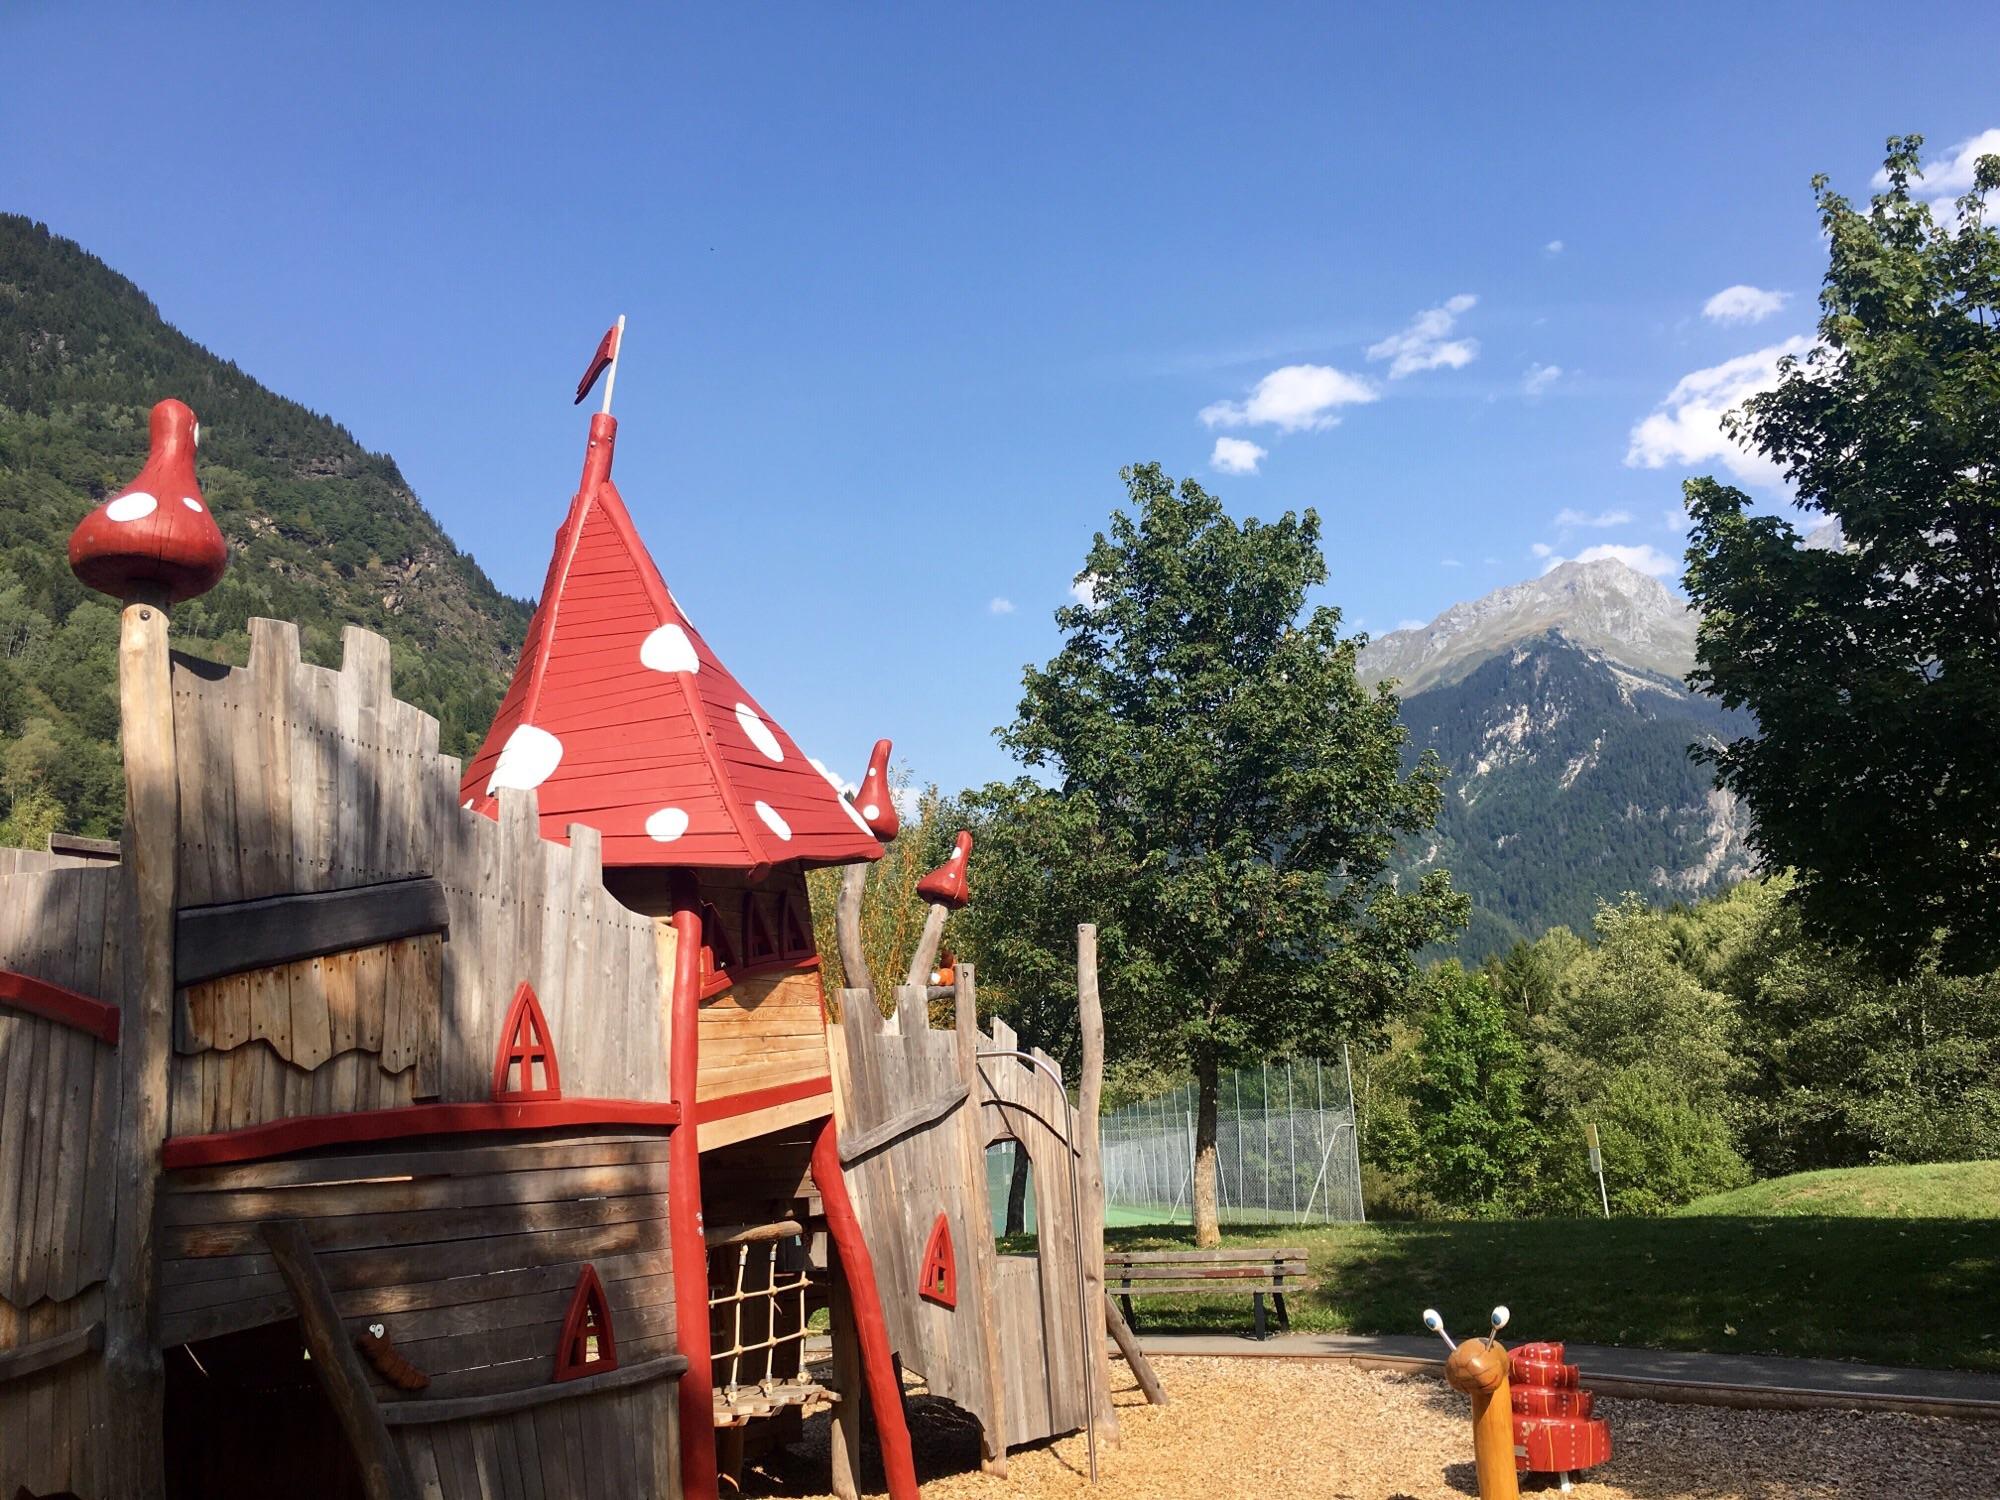 playground at Bozel